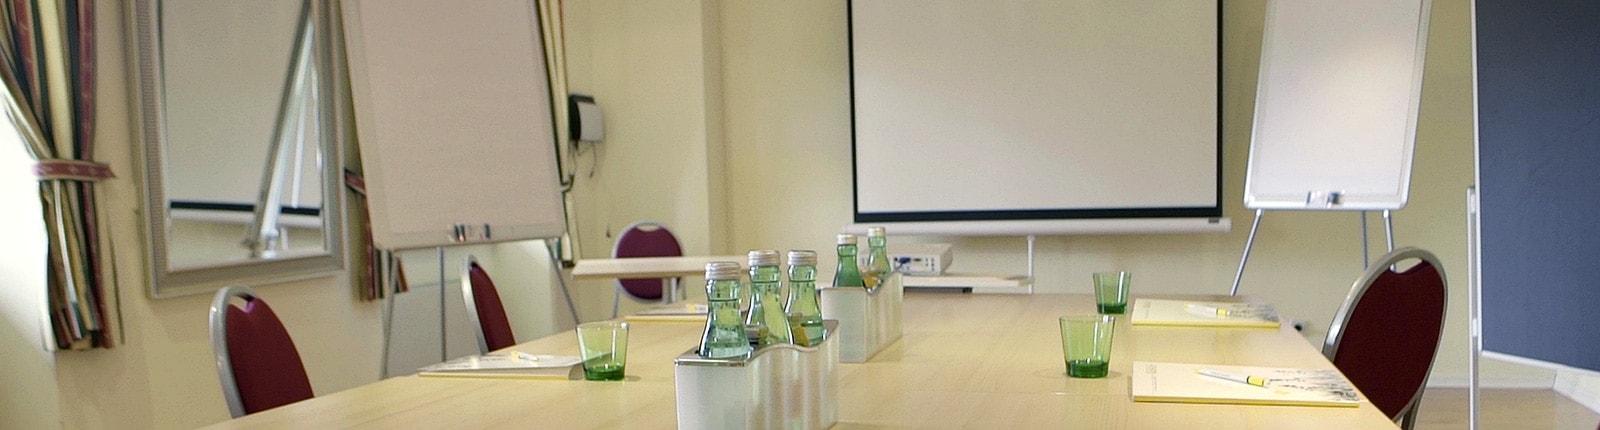 seminar-vidbg